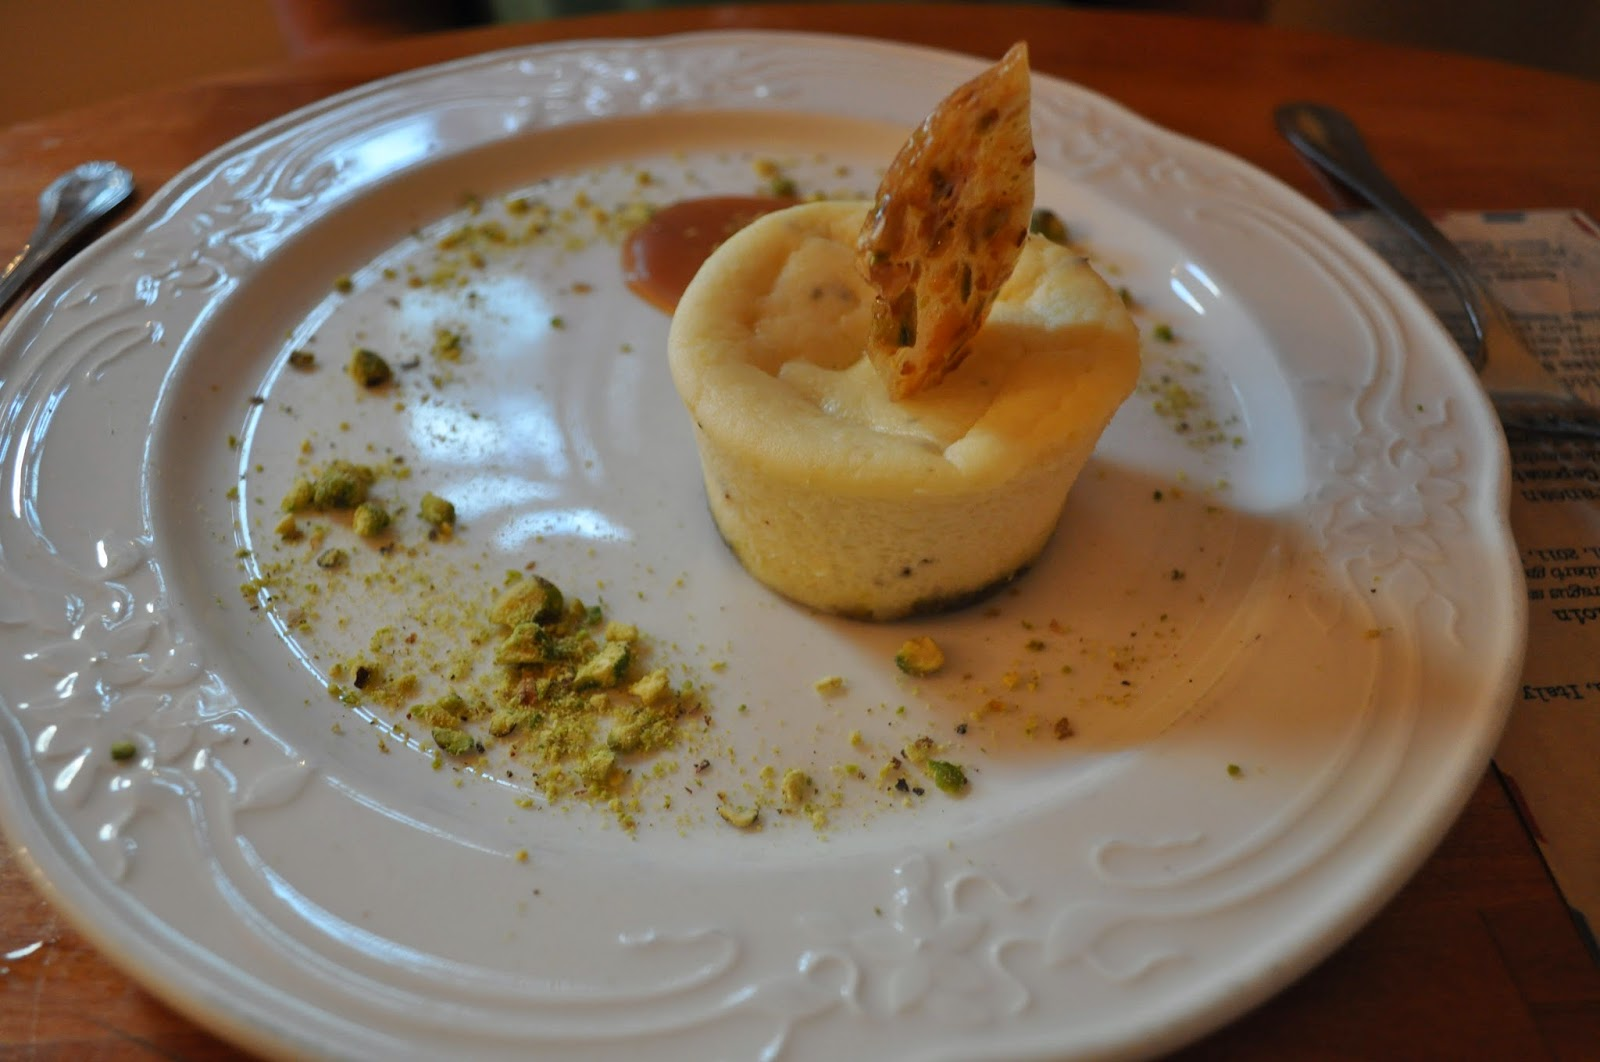 ... Ricotta Cheesecake. Pistachio crust, nut brittle, honey sauce